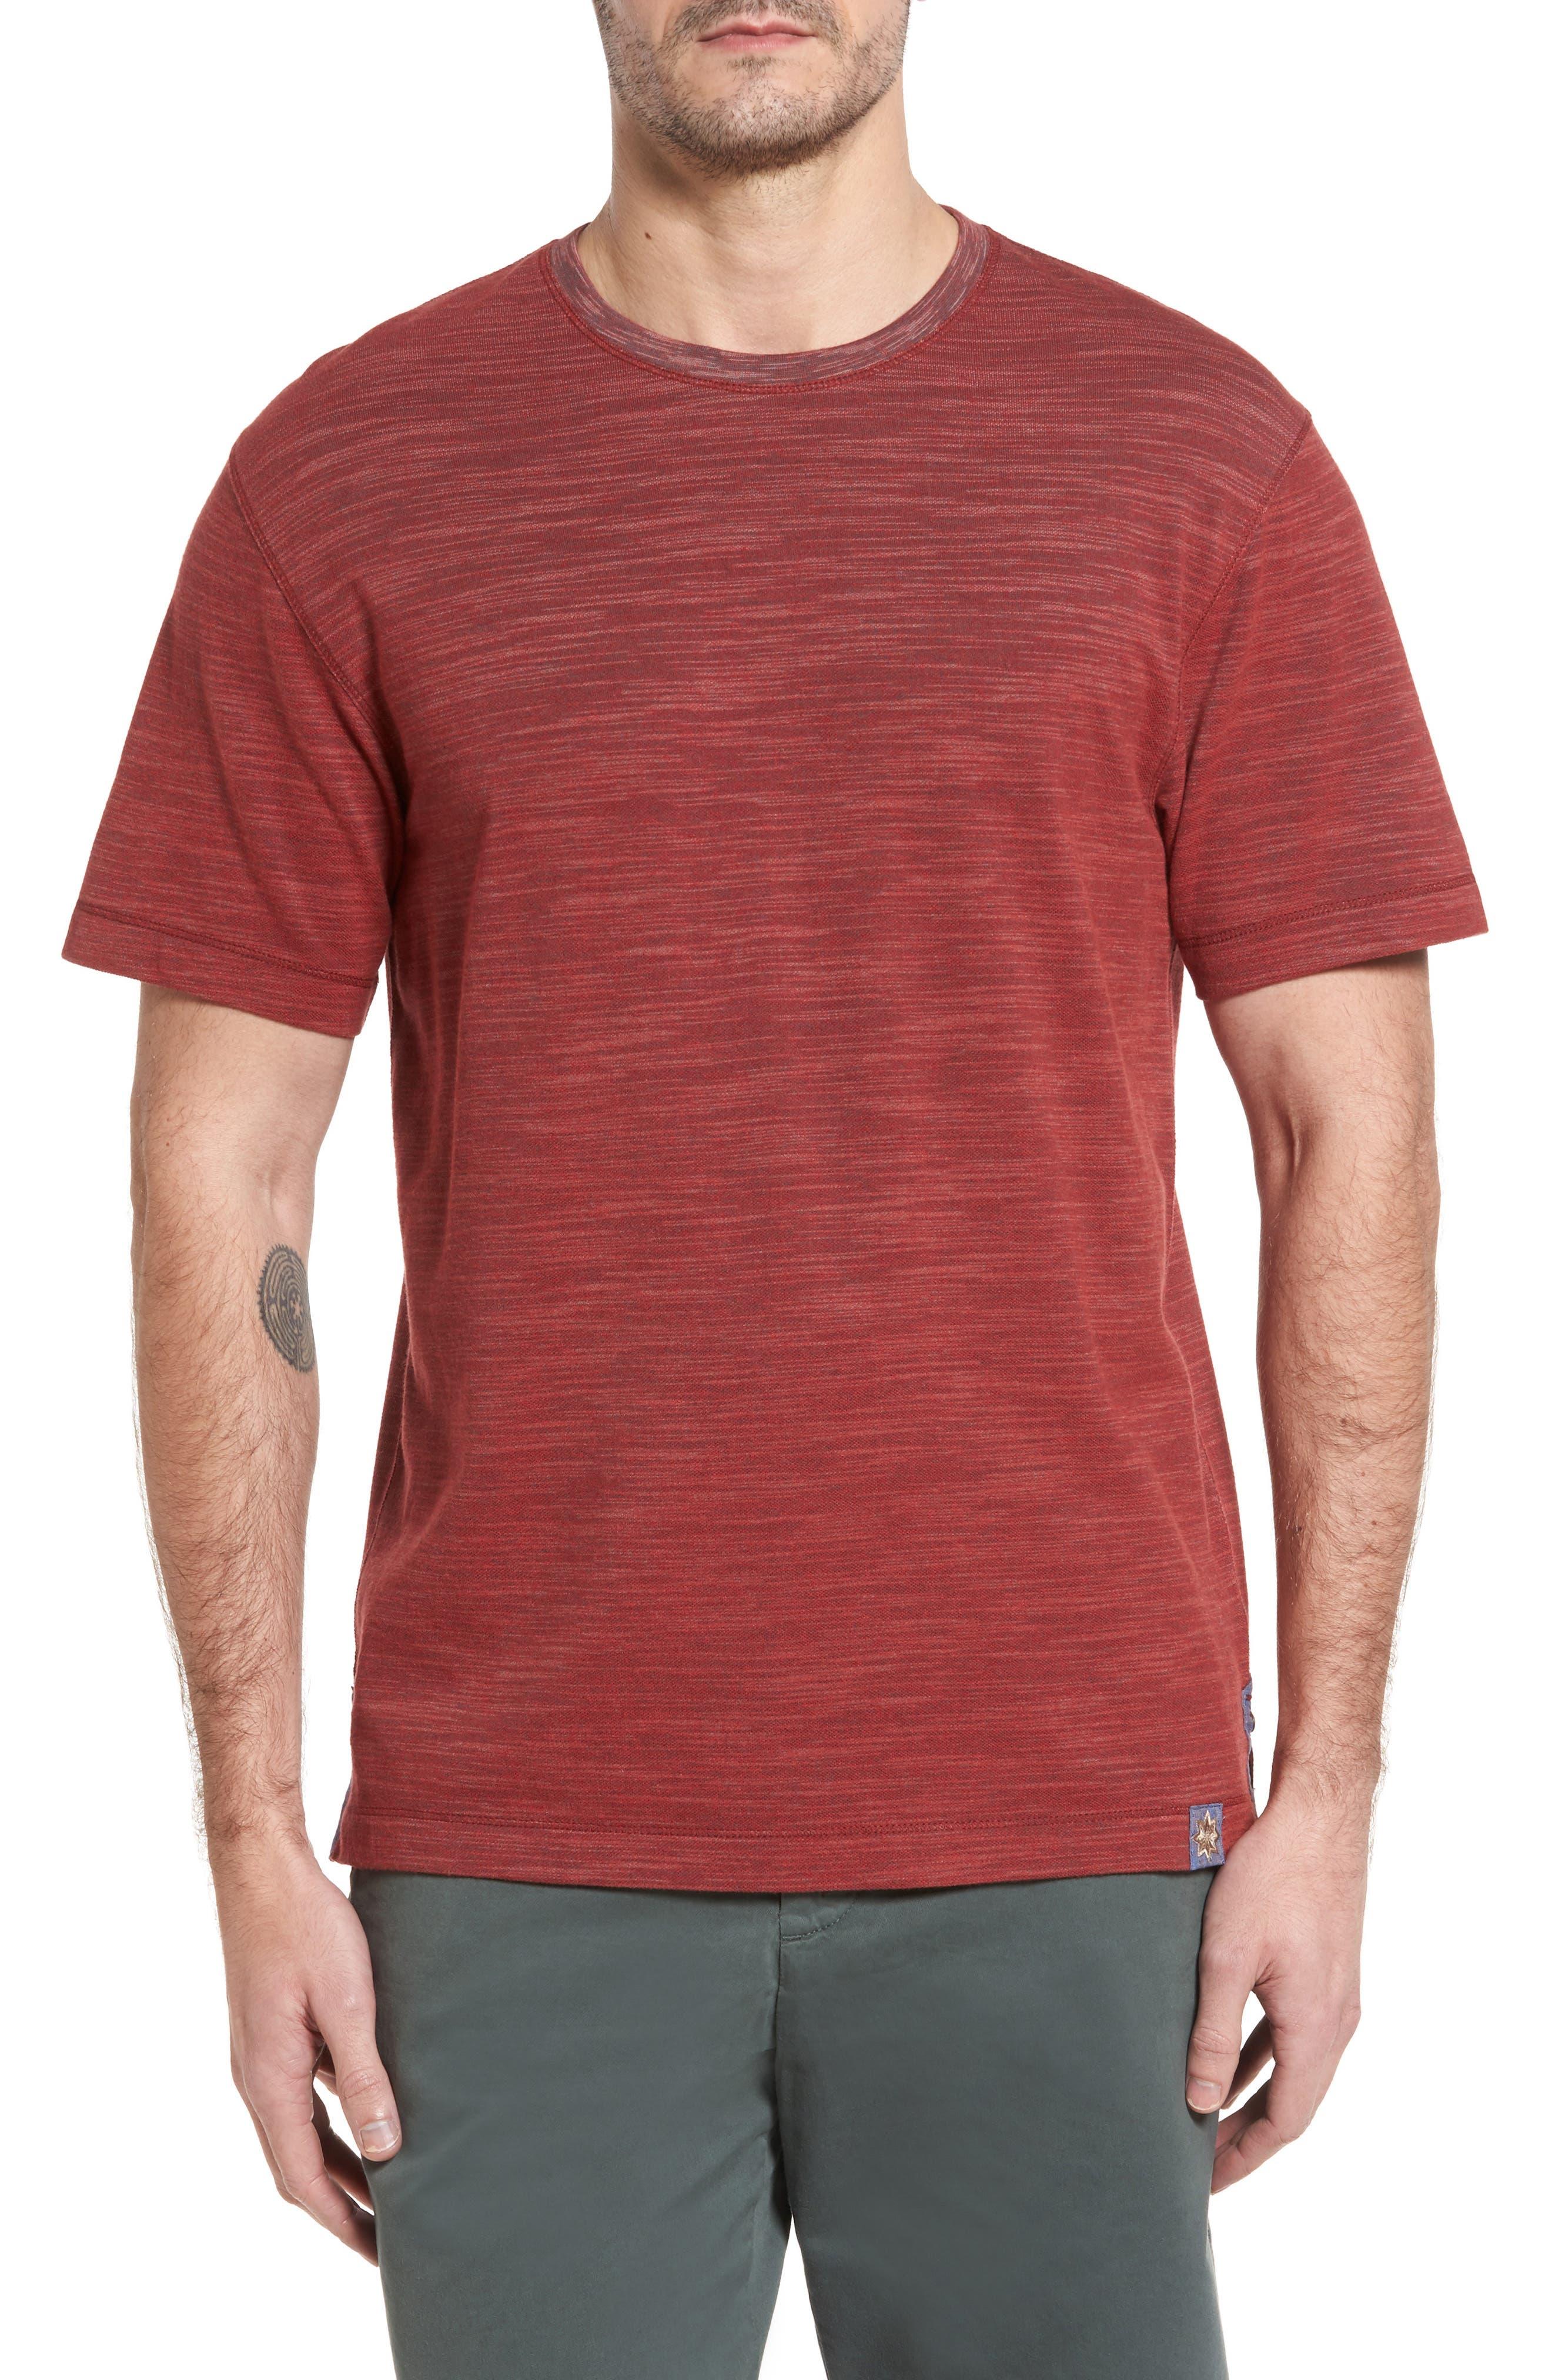 Alternate Image 1 Selected - Thaddeus Paxton Space Dye Piqué T-Shirt